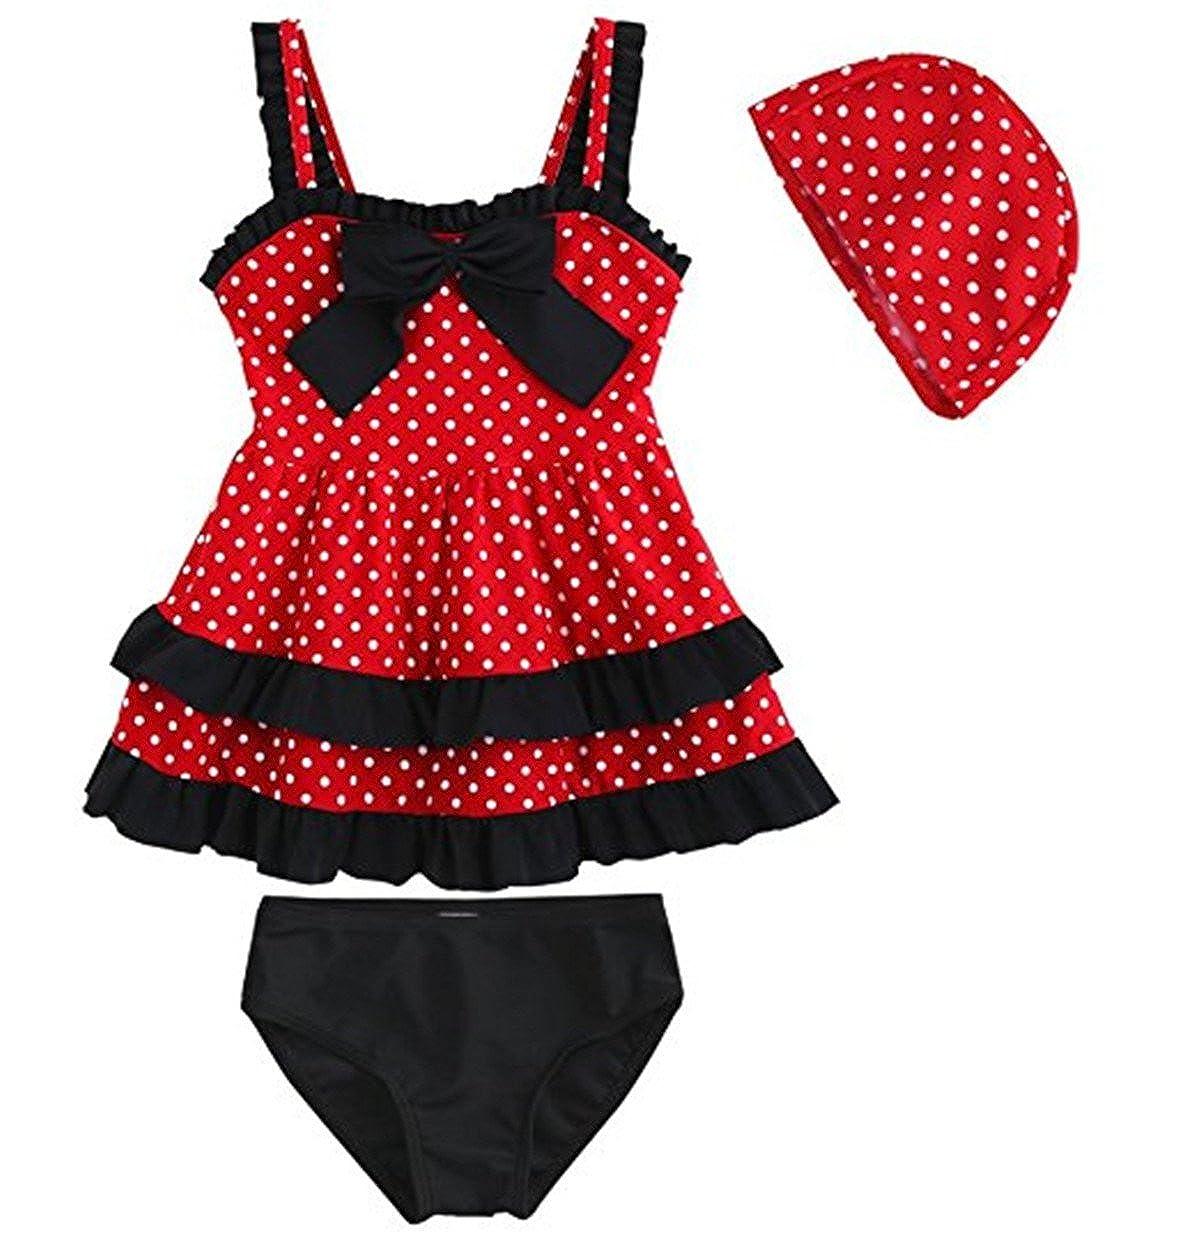 JELEUON Baby Girls Toddler Kids 3 Piece Lace Bow Dot Swimsuit Swimwear Hat bSgirkks003